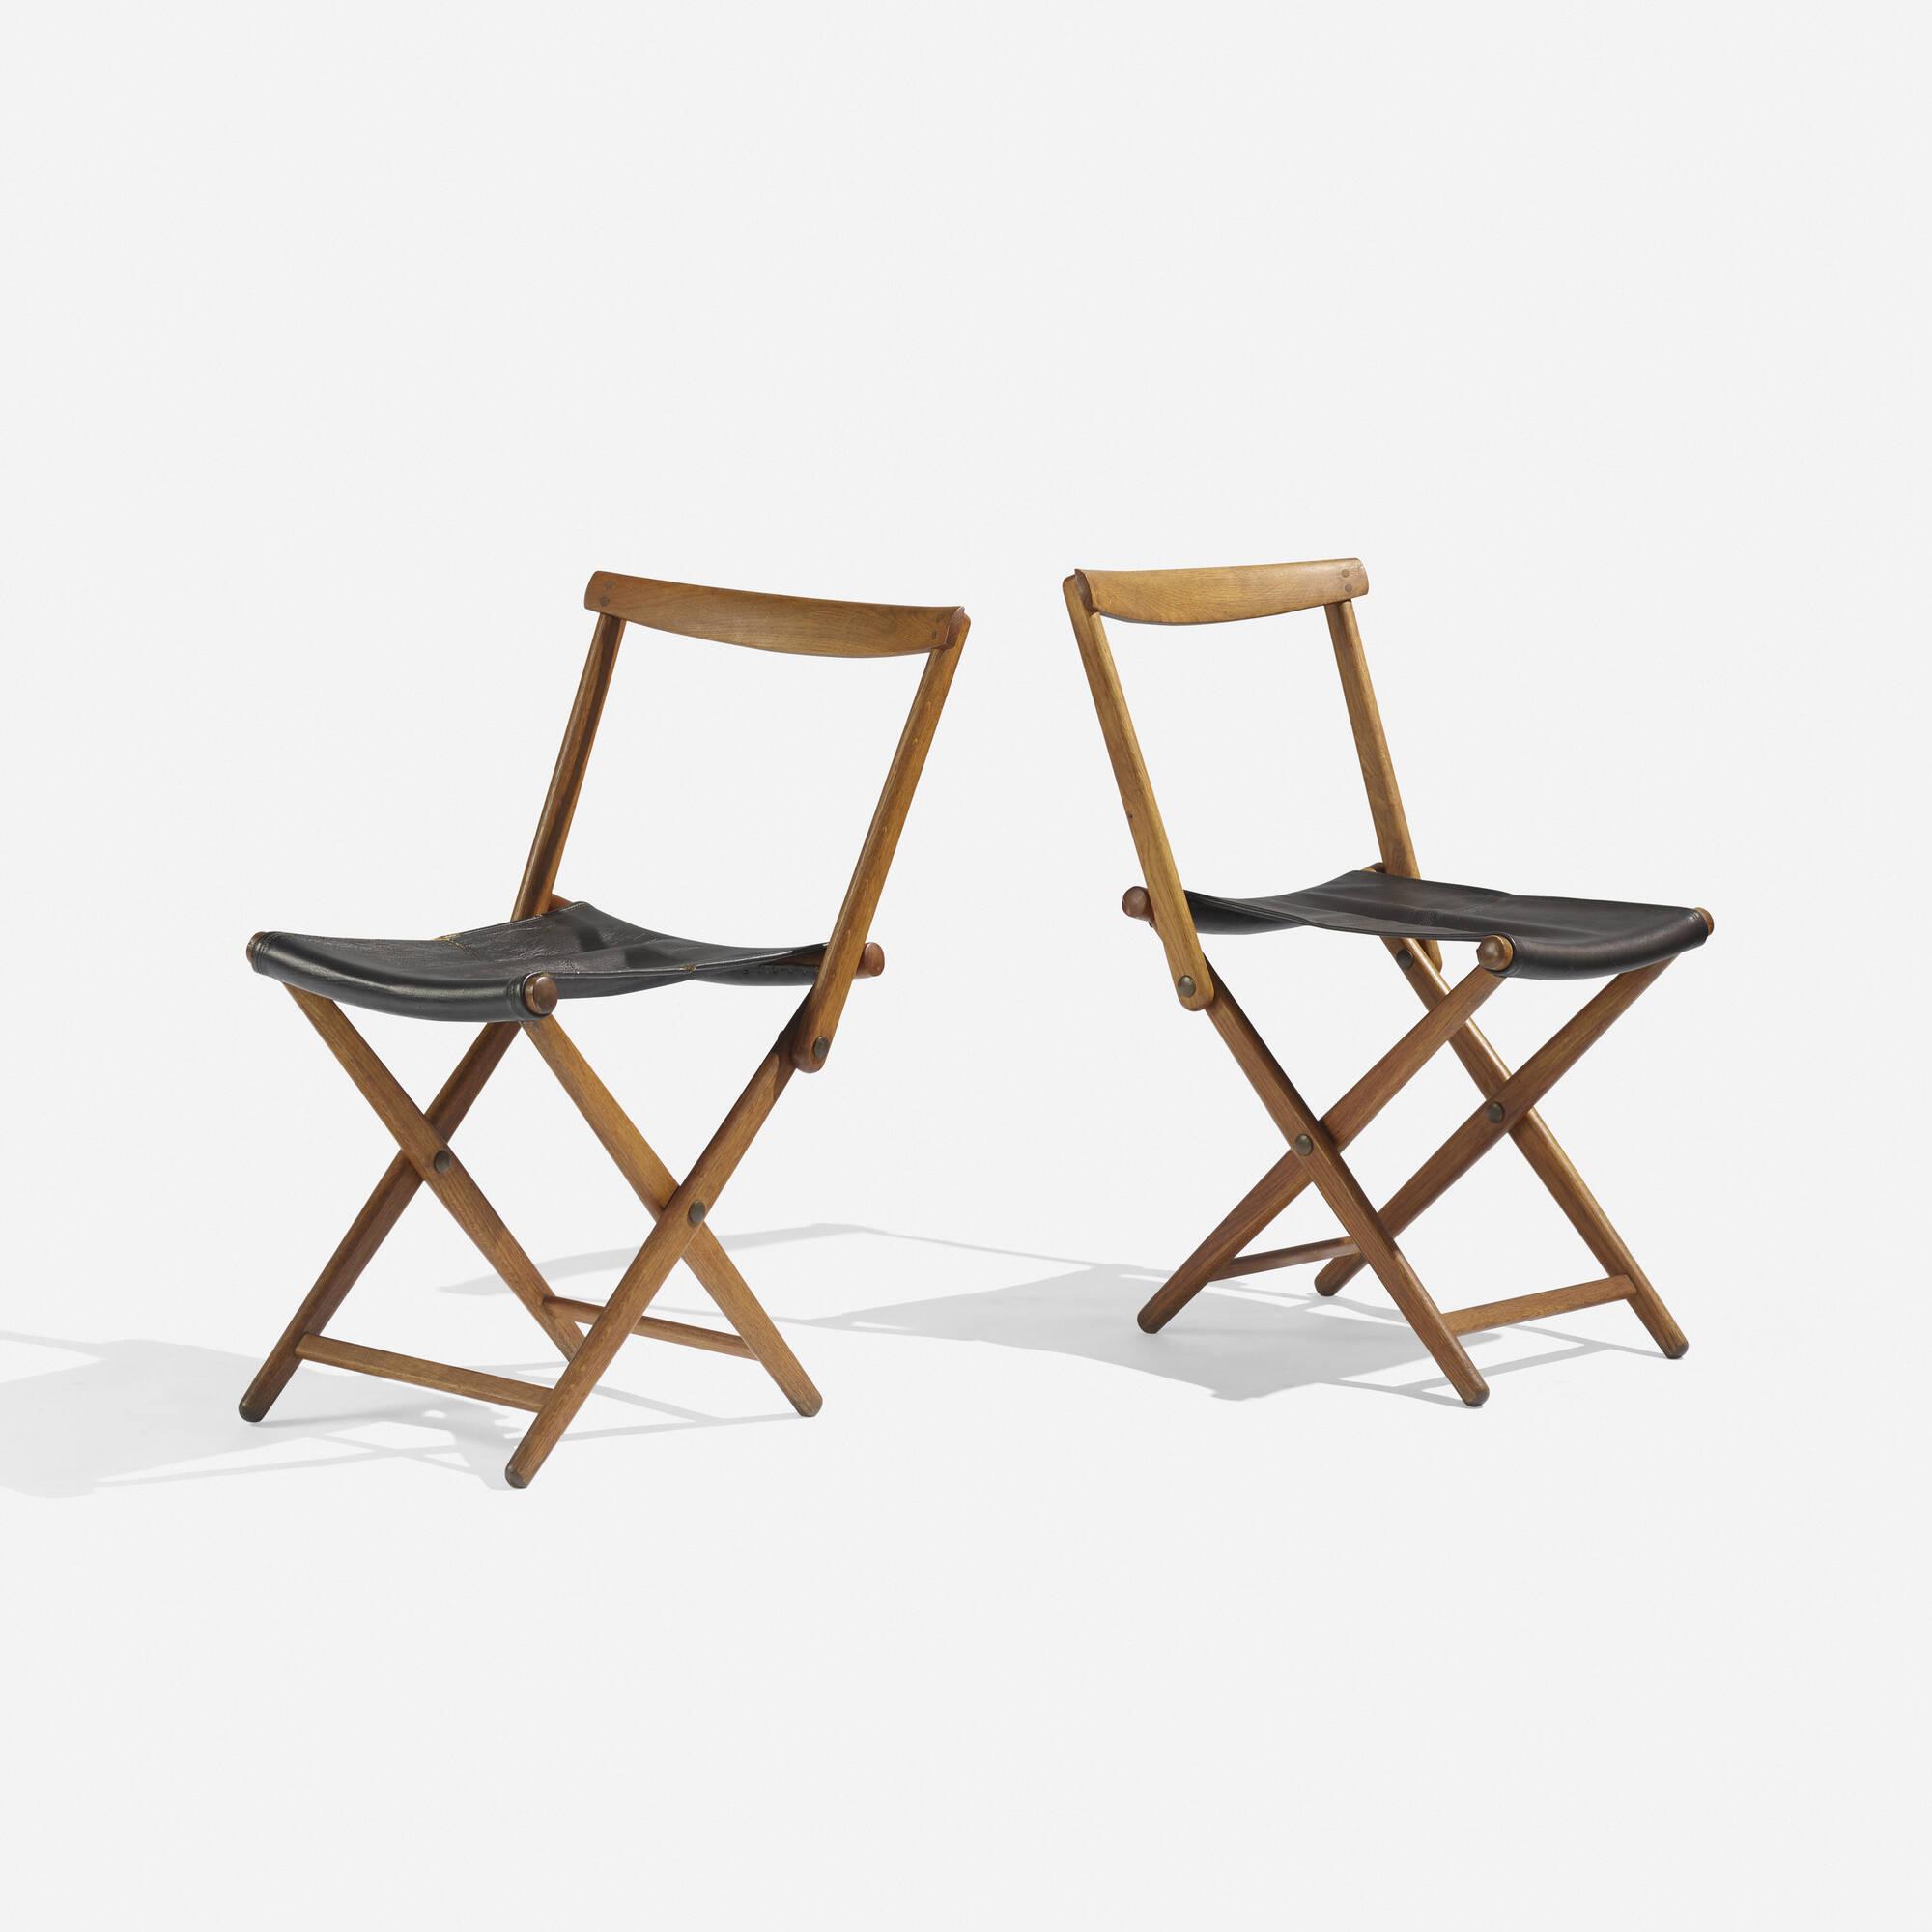 folding chair auction pool float 103 torsten johansson chairs pair